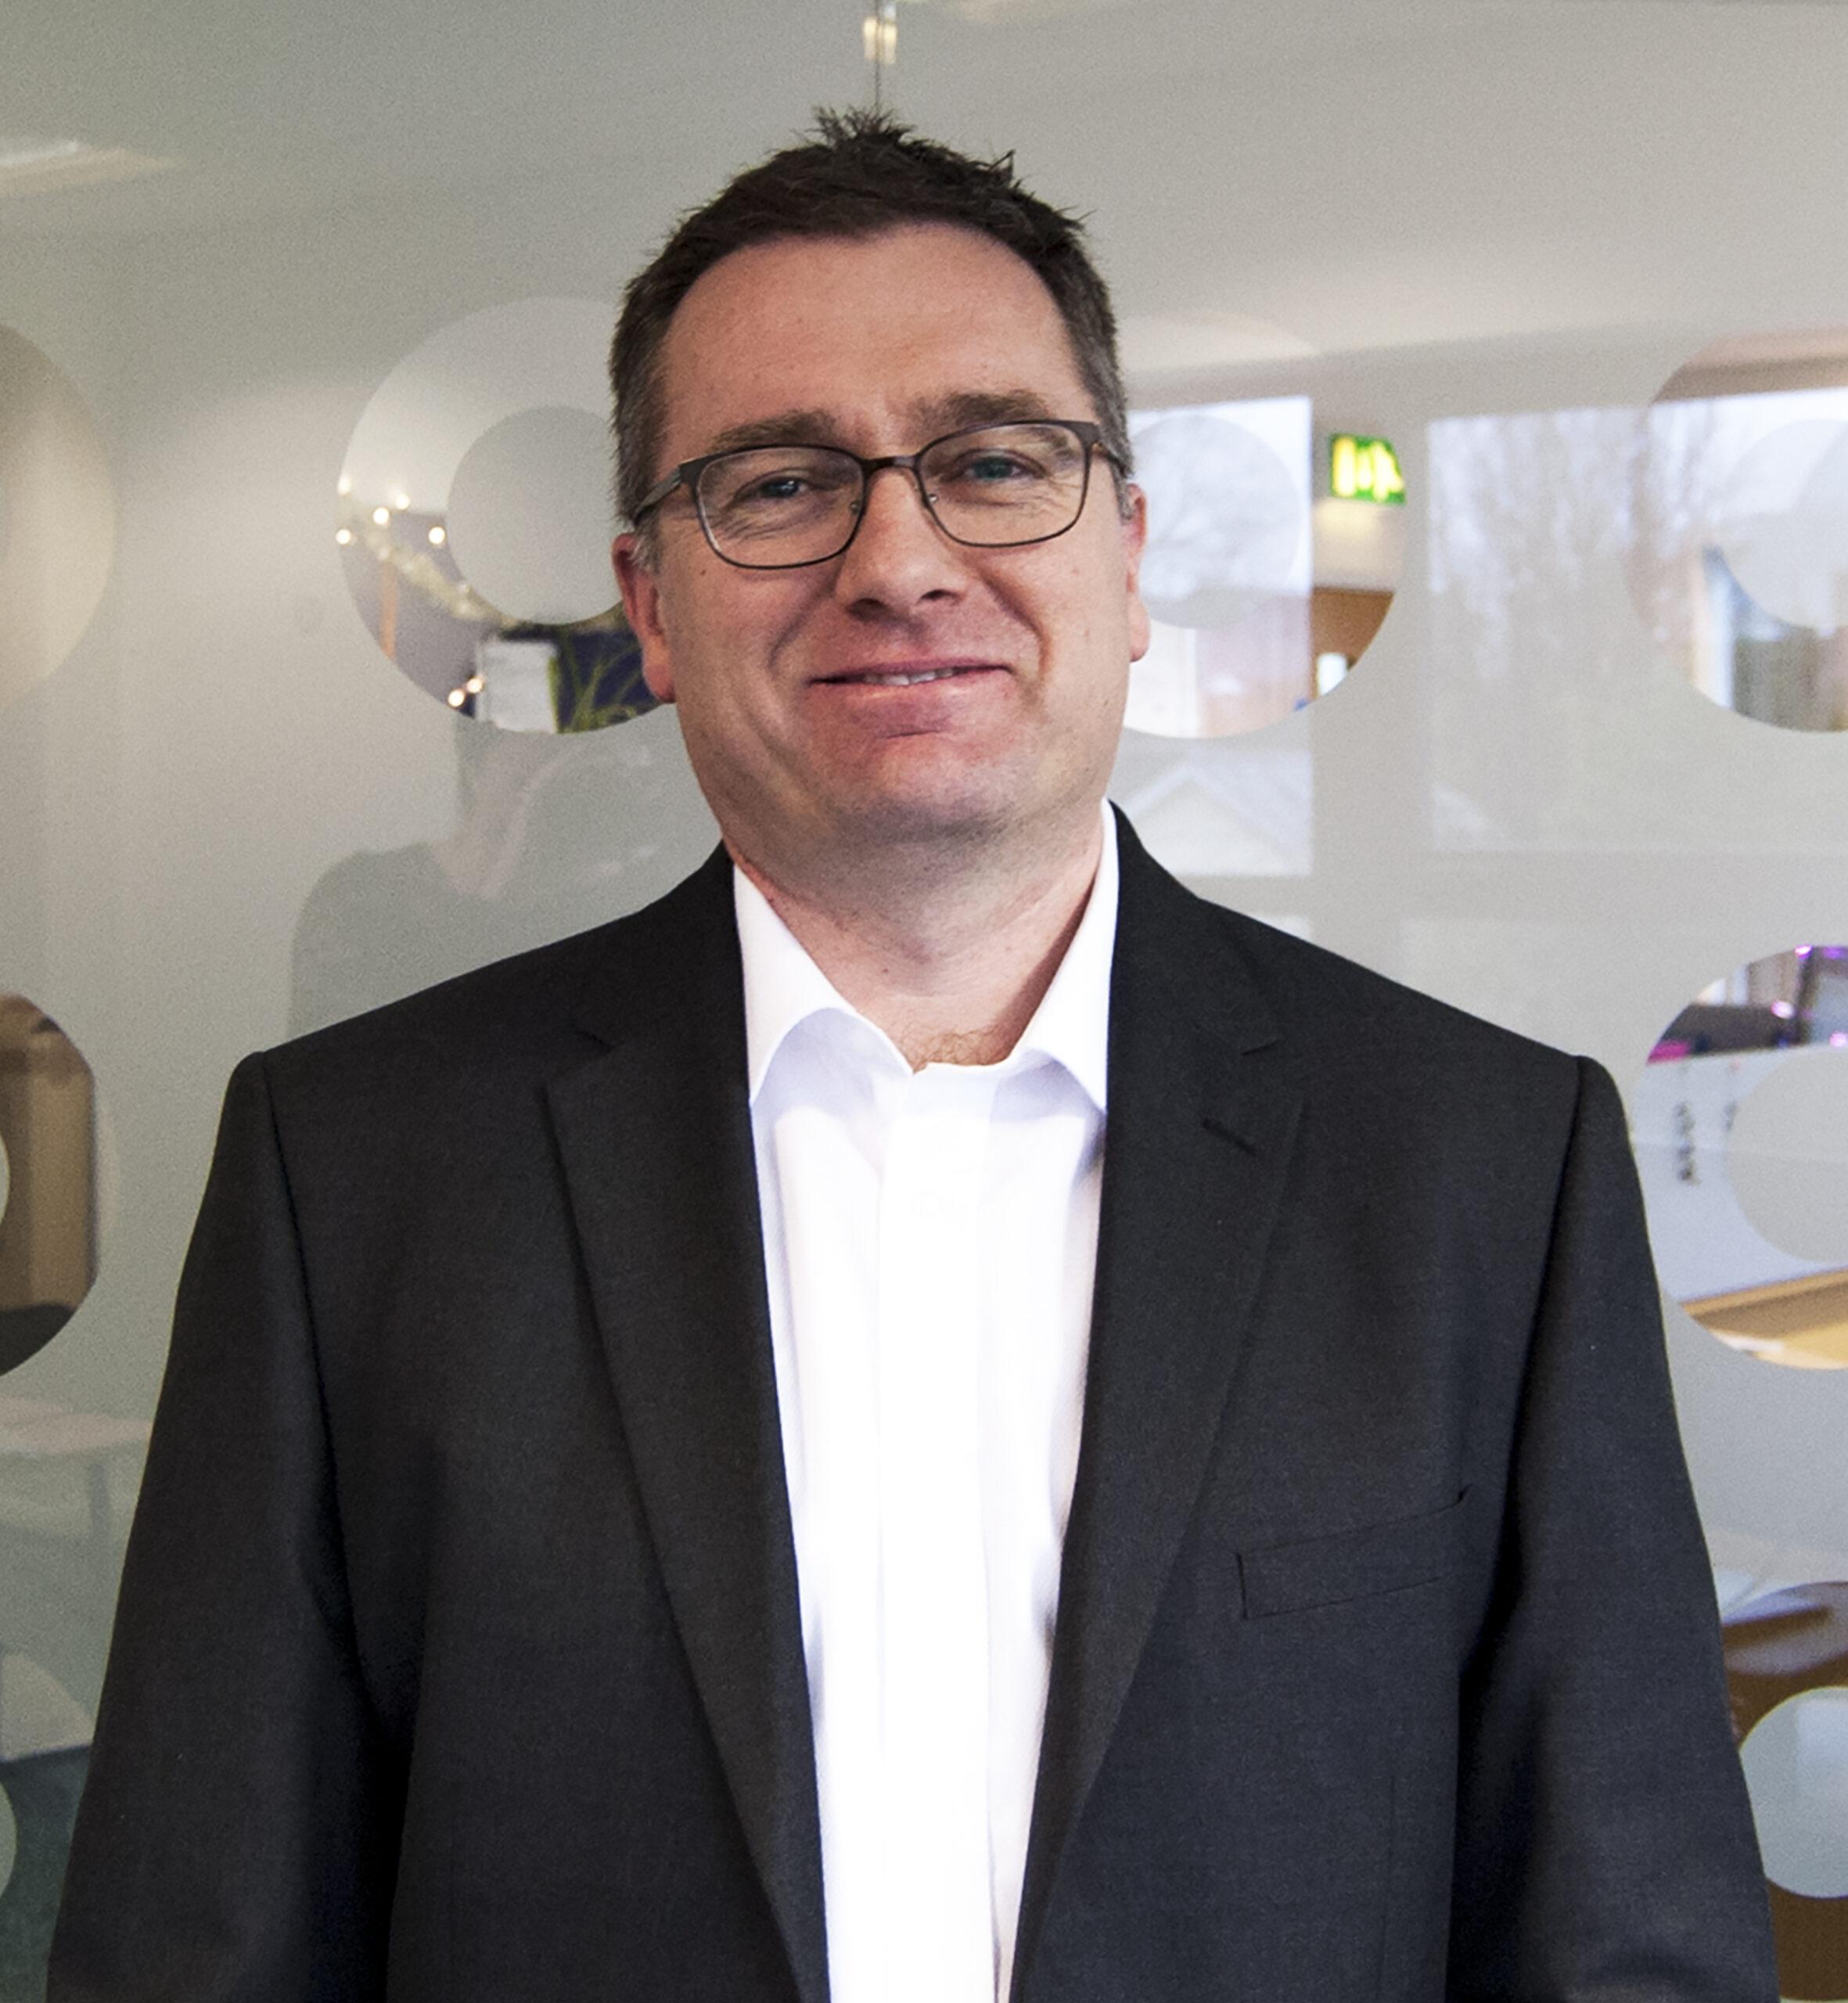 David Bullen – Finance Director